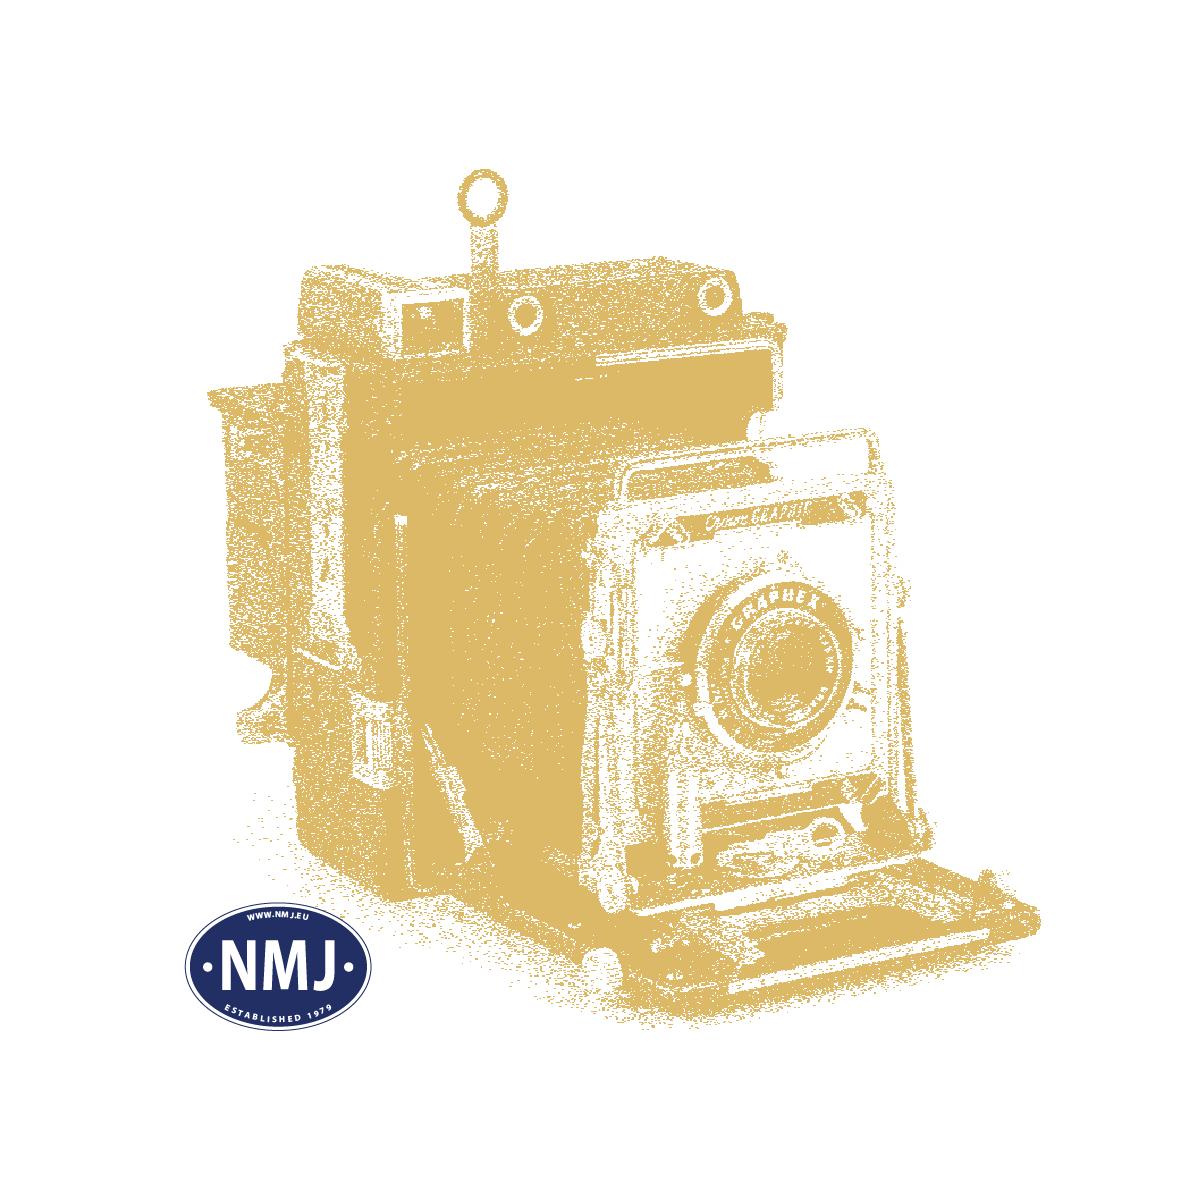 NMJT611.102 - NMJ Topline SJ Lgjns 42 74 443 0 780-2 med ASG Thermocontainer